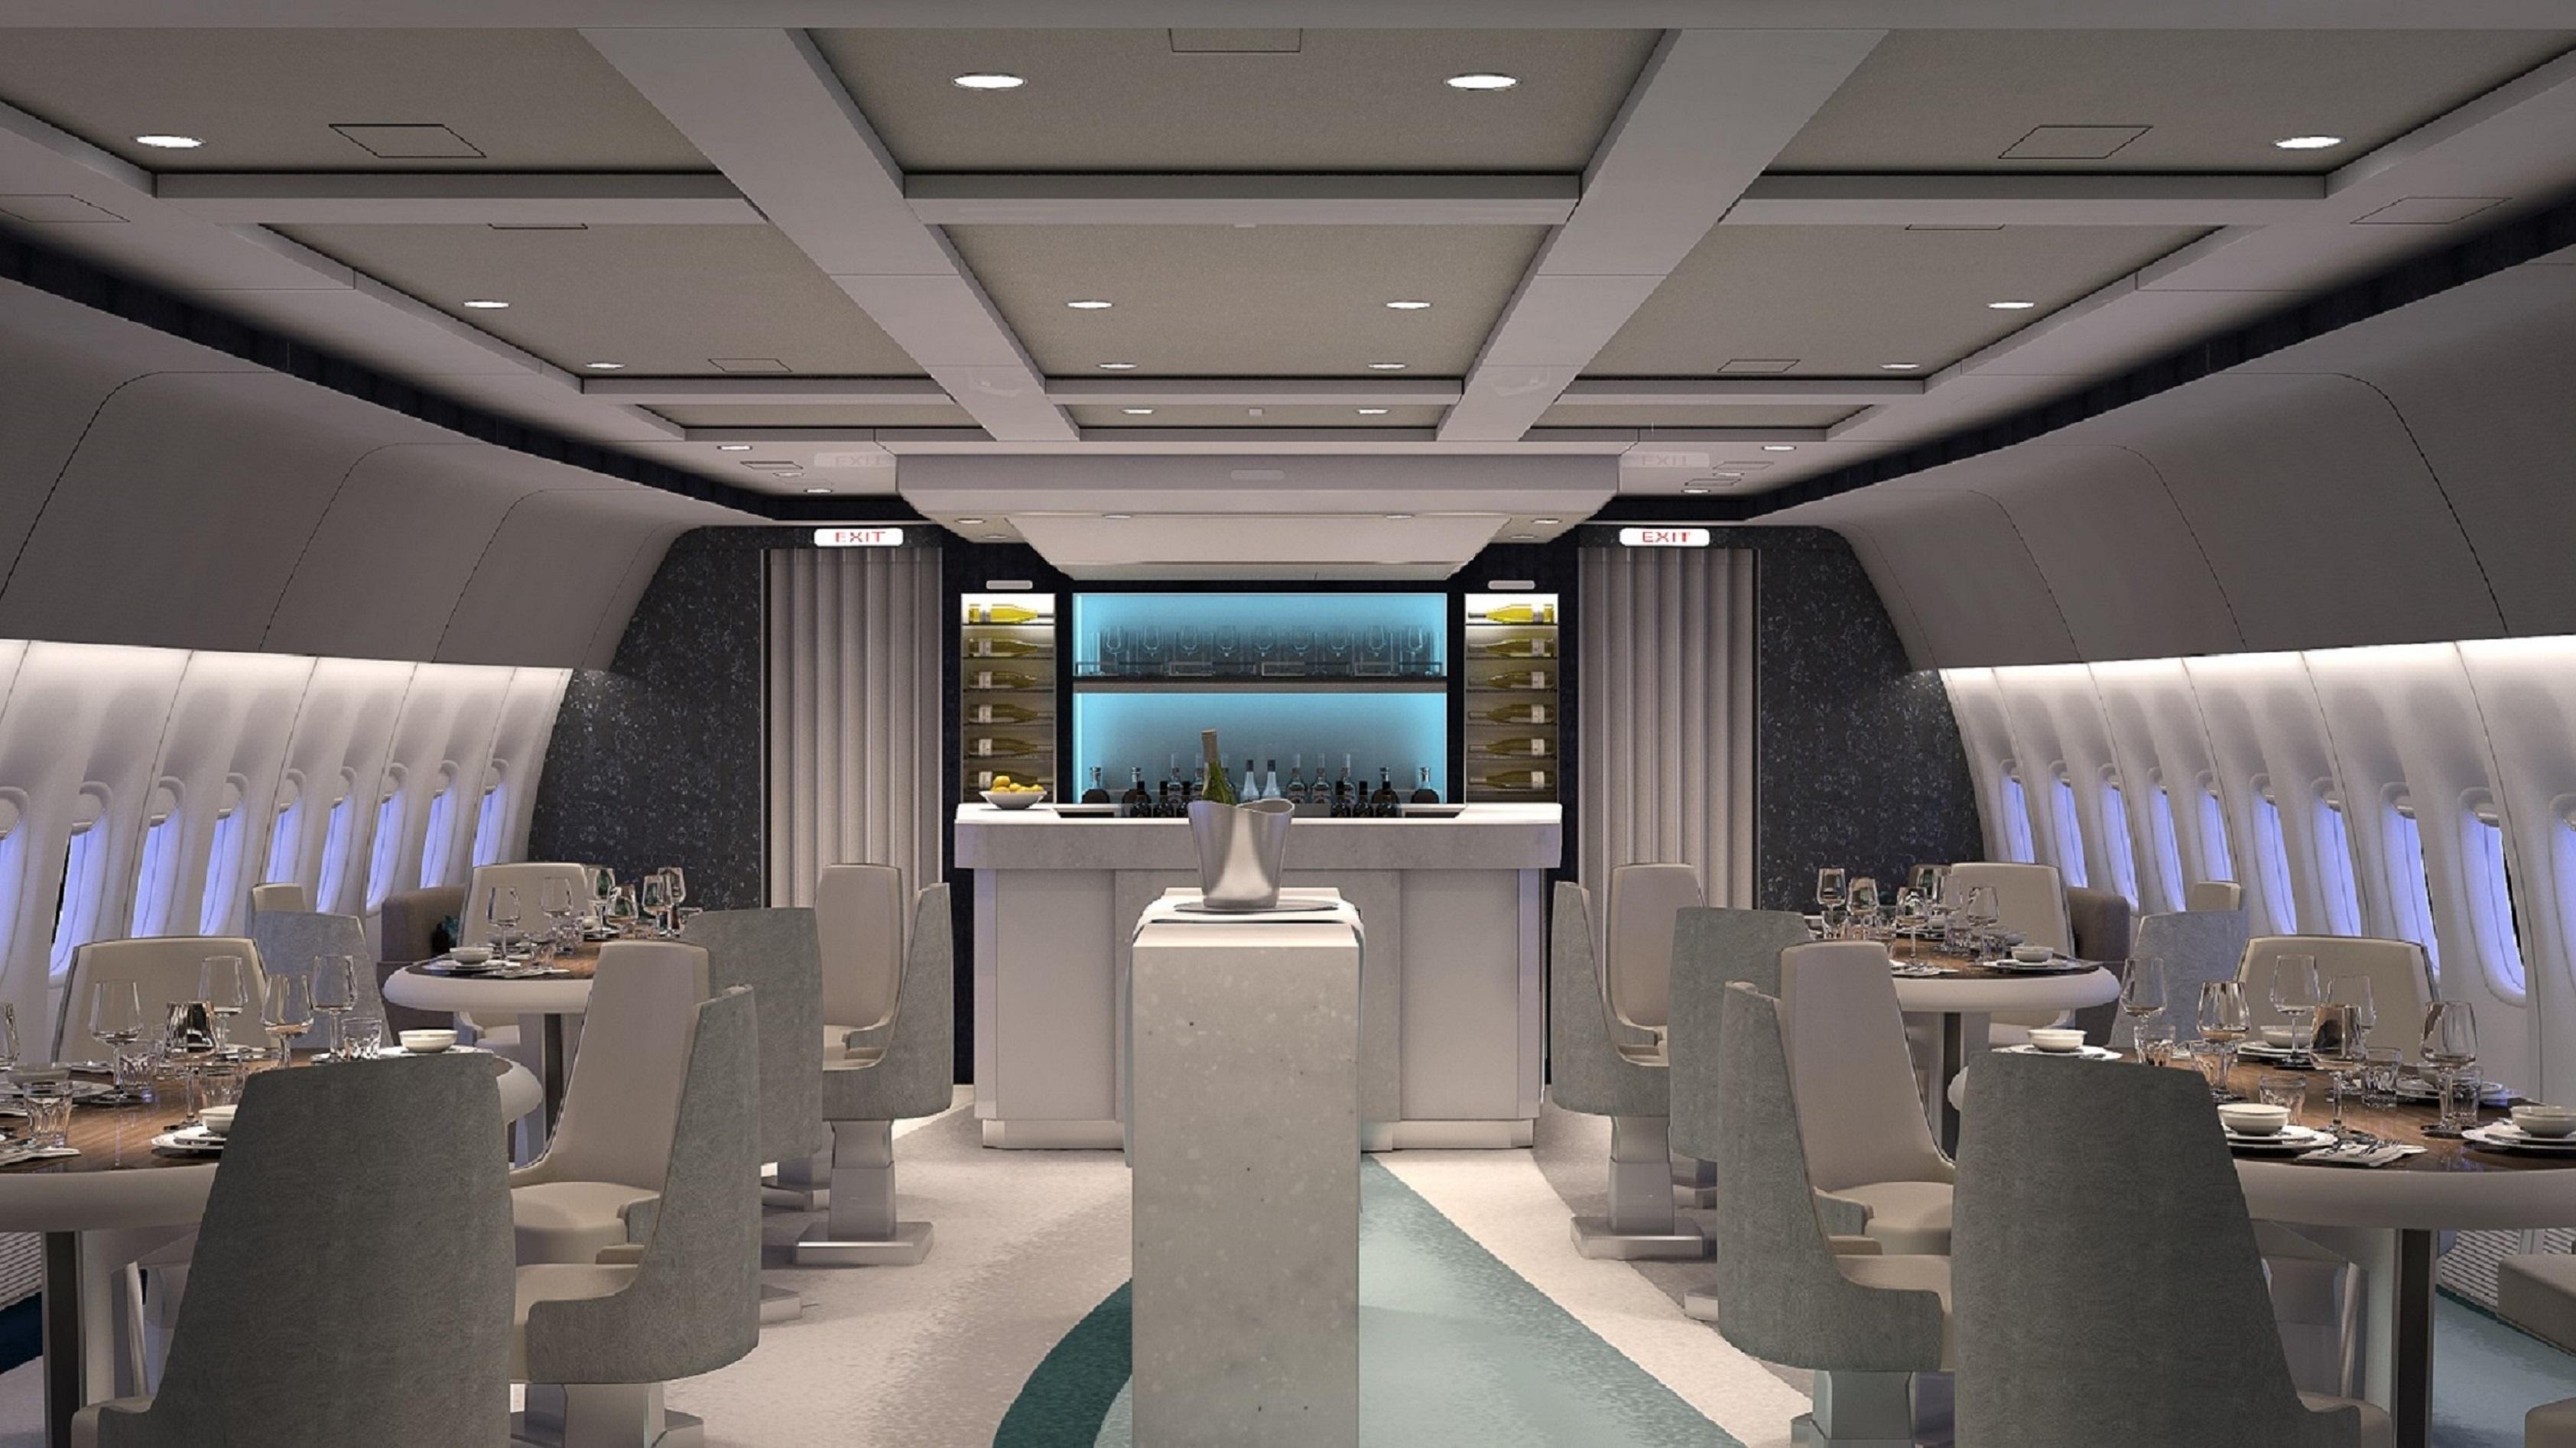 crystal-aircruises-777-lounge-and-bar-2-night